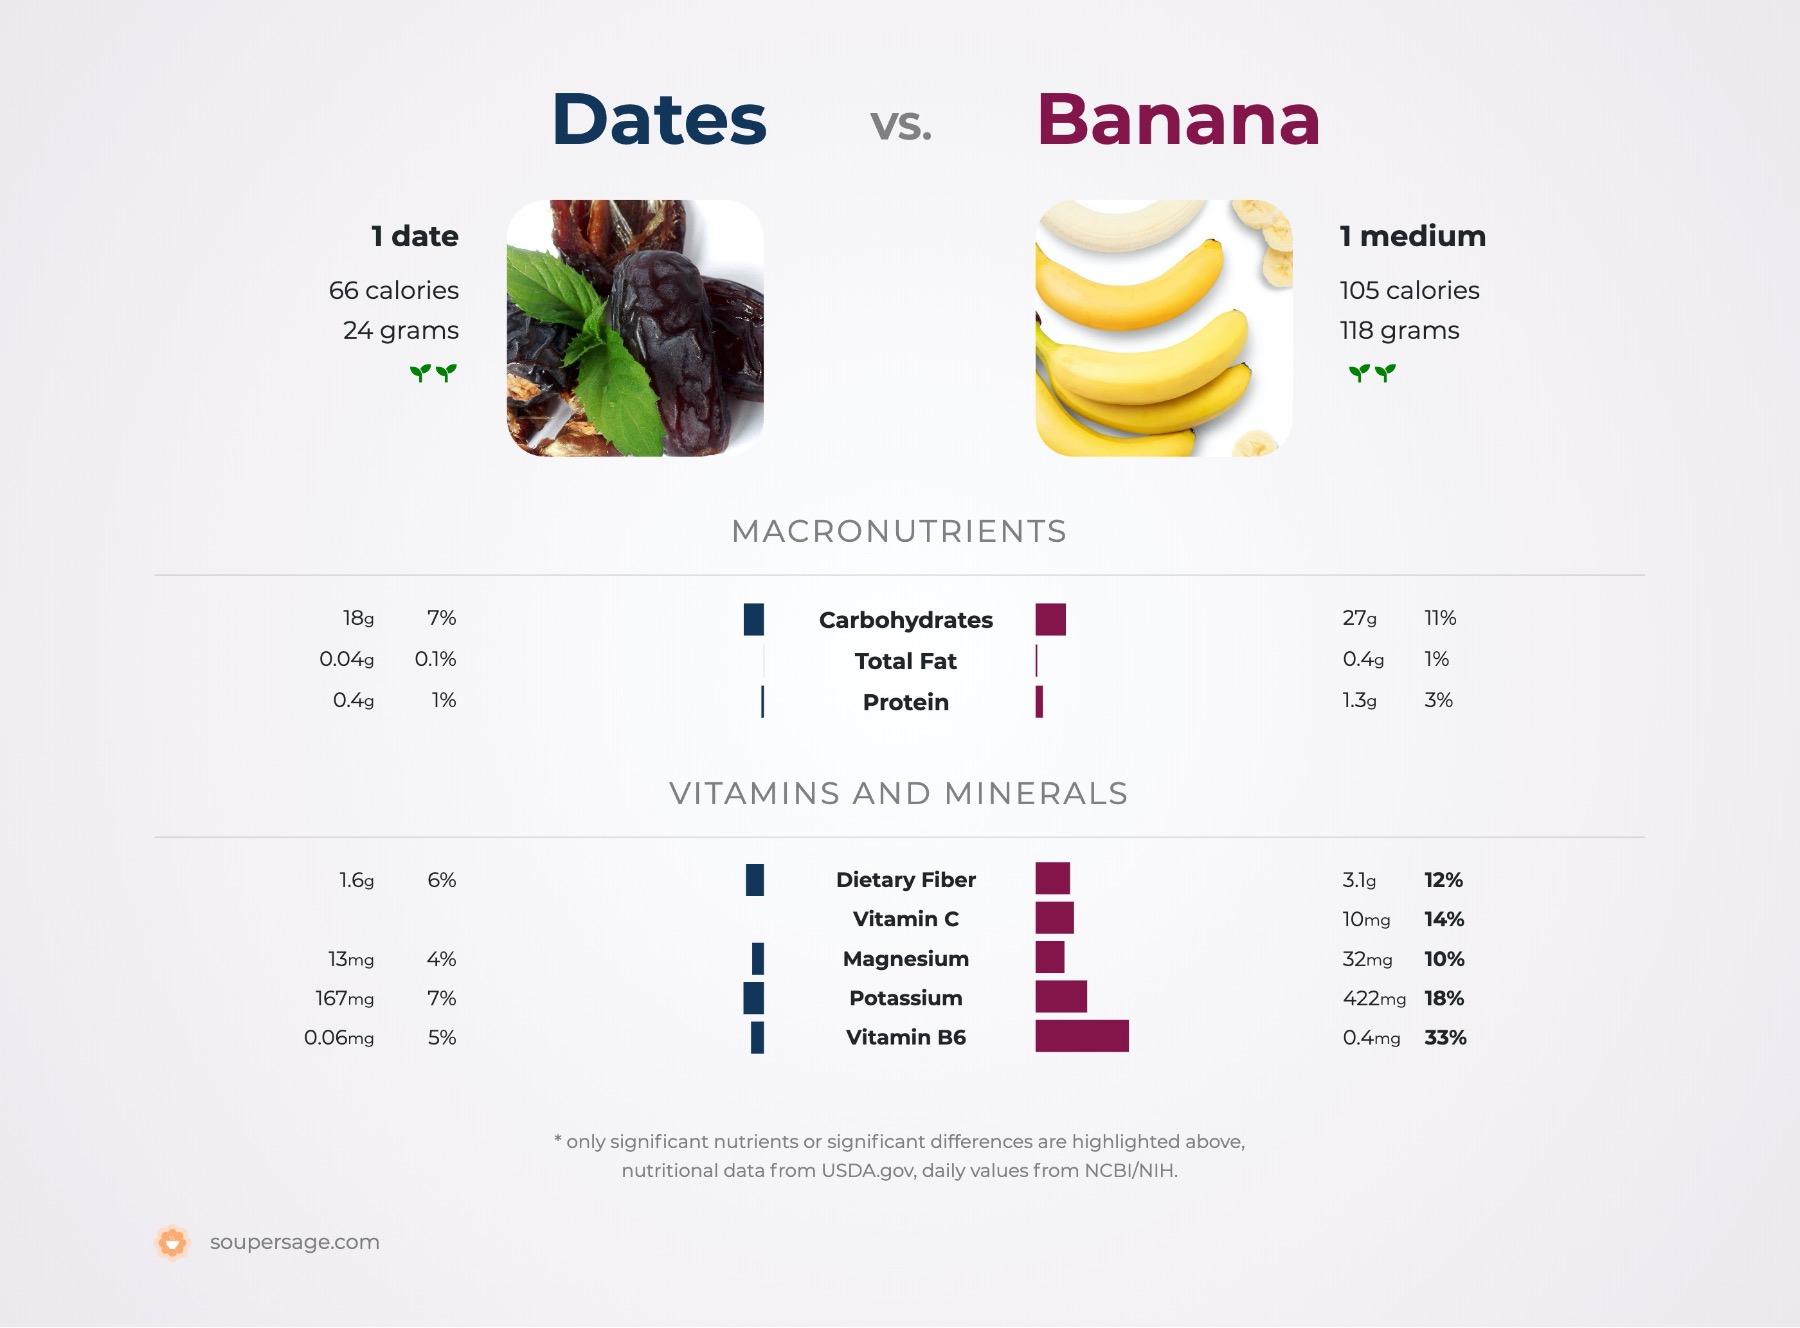 nutrition comparison of banana vs. dates